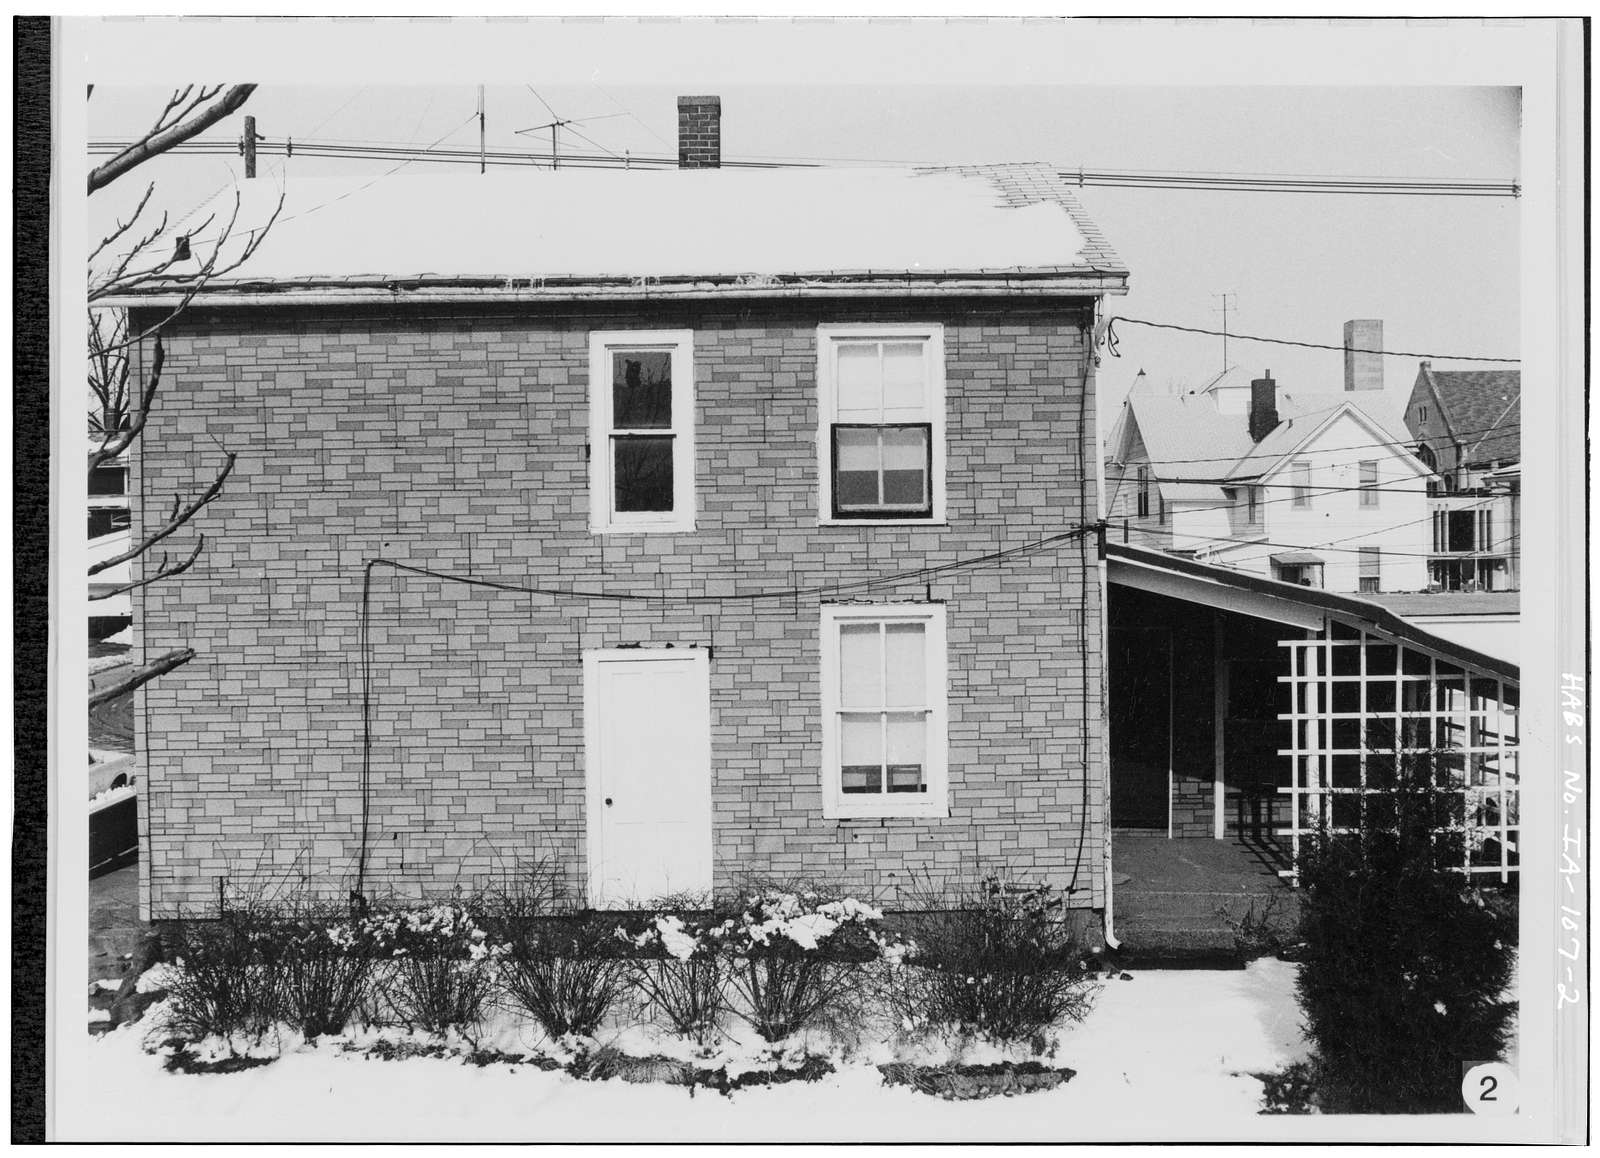 Alexander Clark Houses, 307-309 Chestnut Street, Muscatine, Muscatine County, IA